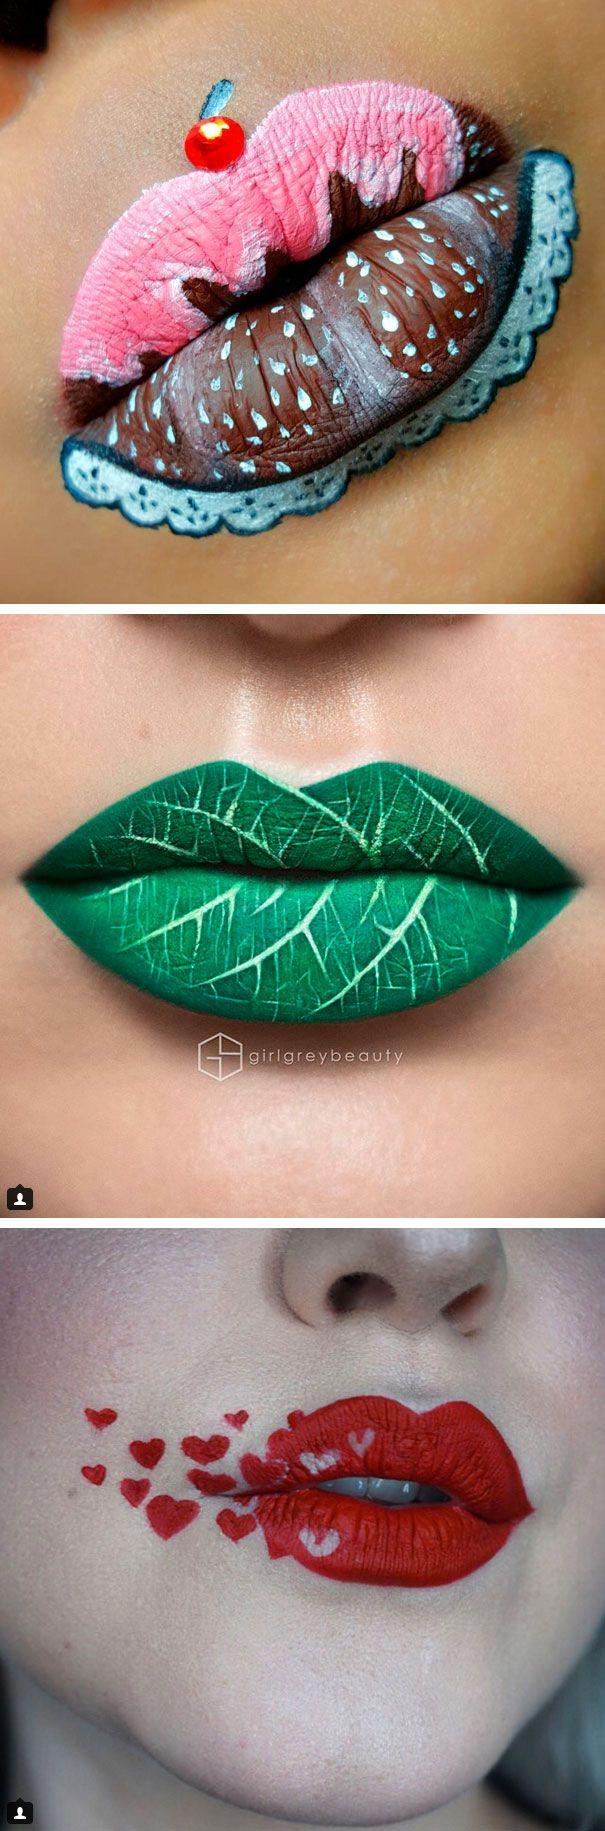 Lip art masterpieces kiss boring beauty looks goodbye